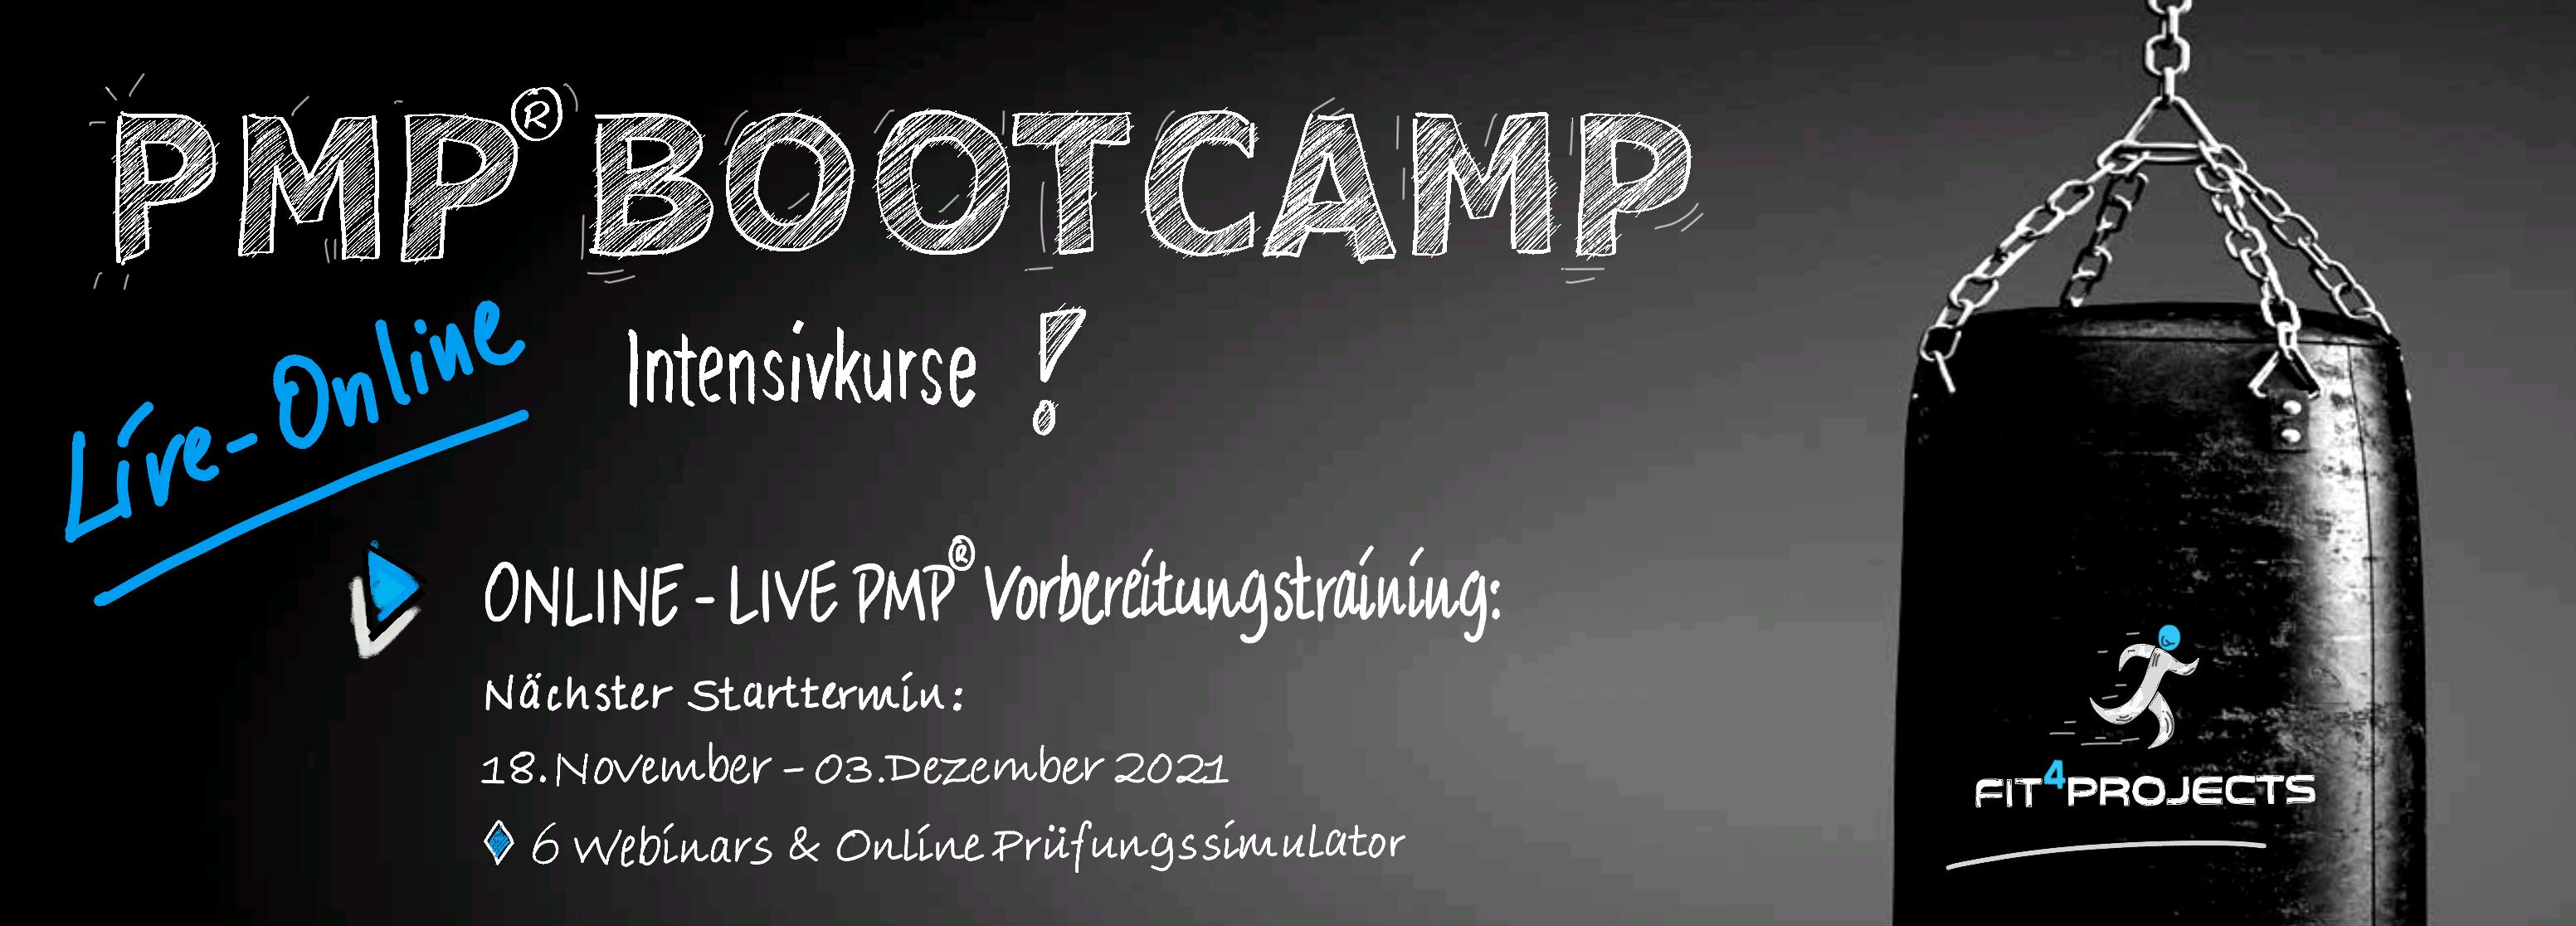 PMP Next Bootcamp